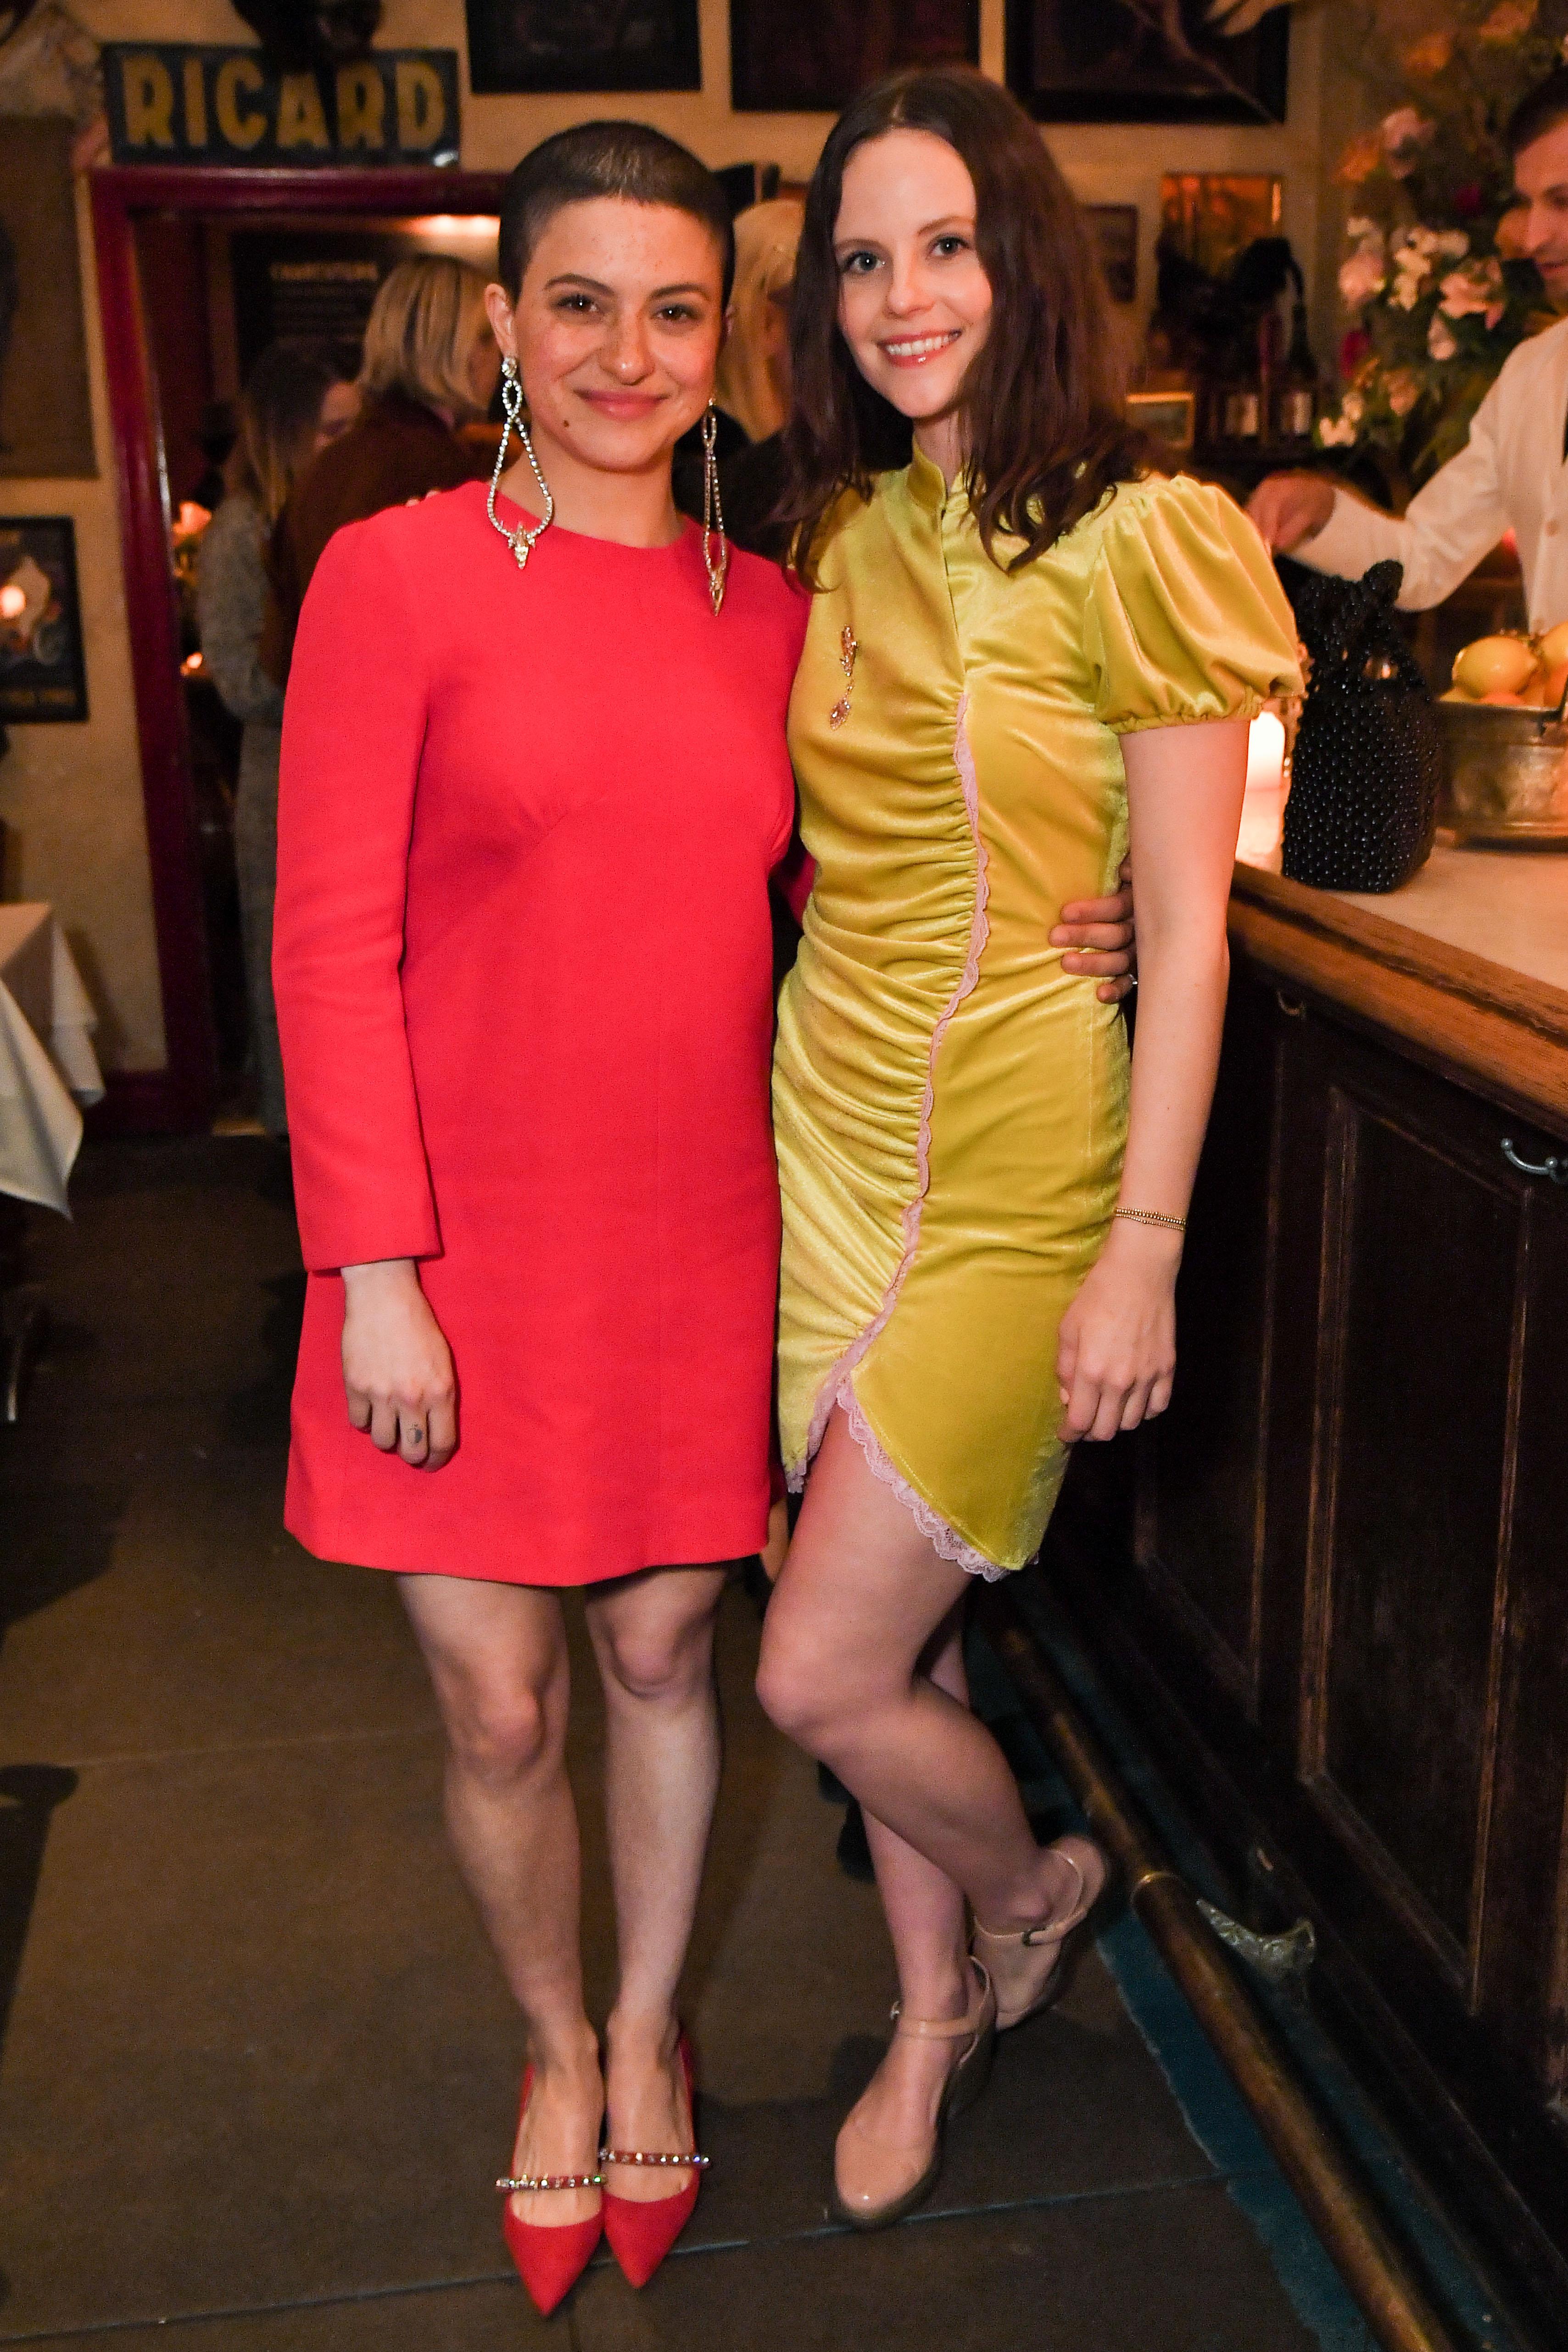 Alia Shawkat and Sarah RamosMiu Miu 'SHAKO MAKO' Release Party, After Party, Vista Theater, Los Angeles, USA - 25 Jan 2019